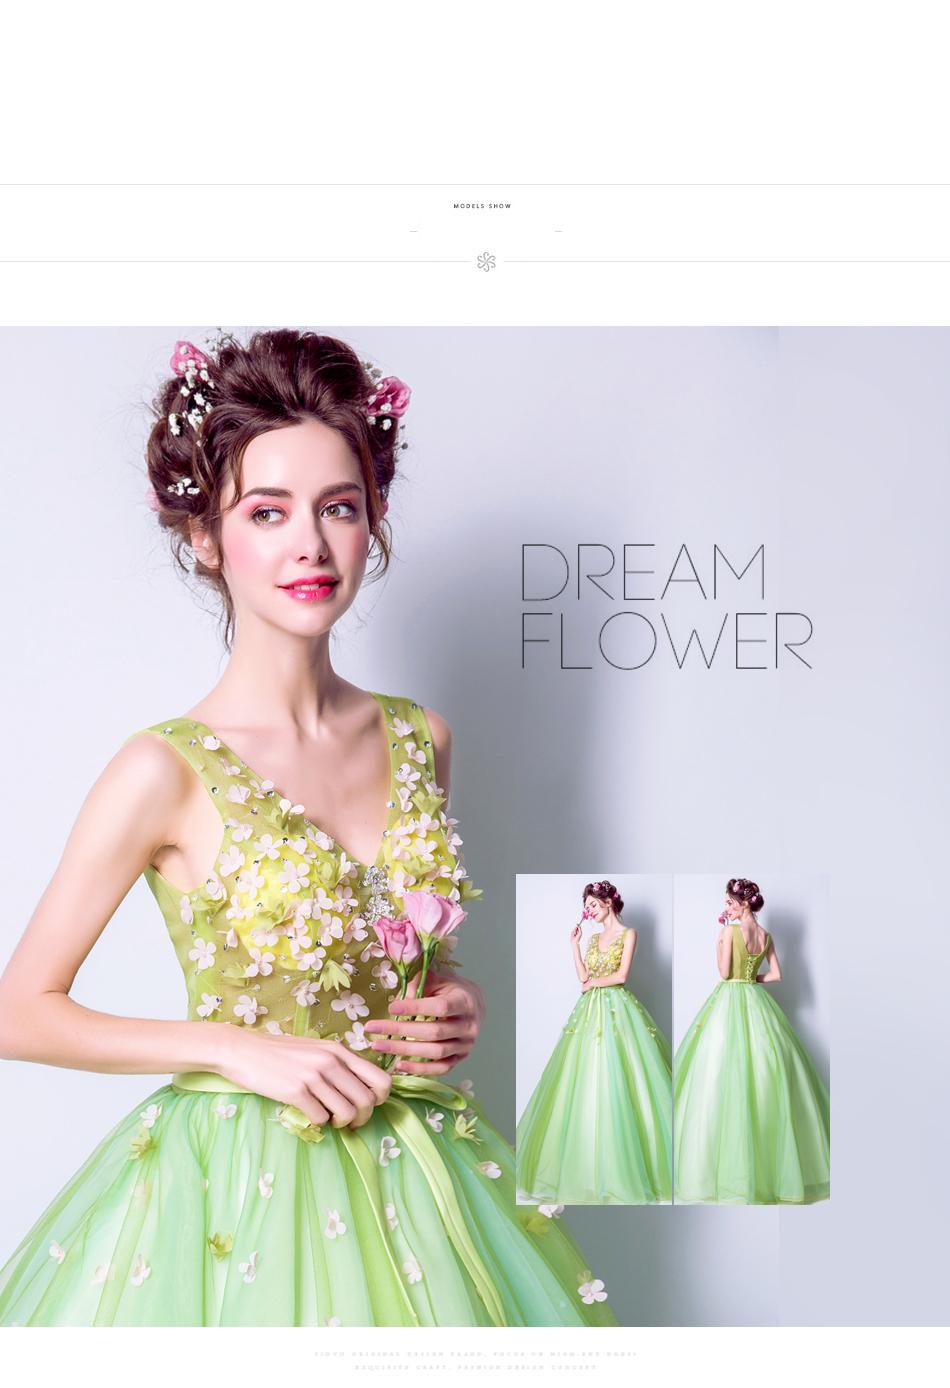 Angel Wedding Dress Marriage Bride Bridal Gown Vestido De Noiva 2017Soft powder, Qingjian Lvxian beauty, petals, green 9718 5